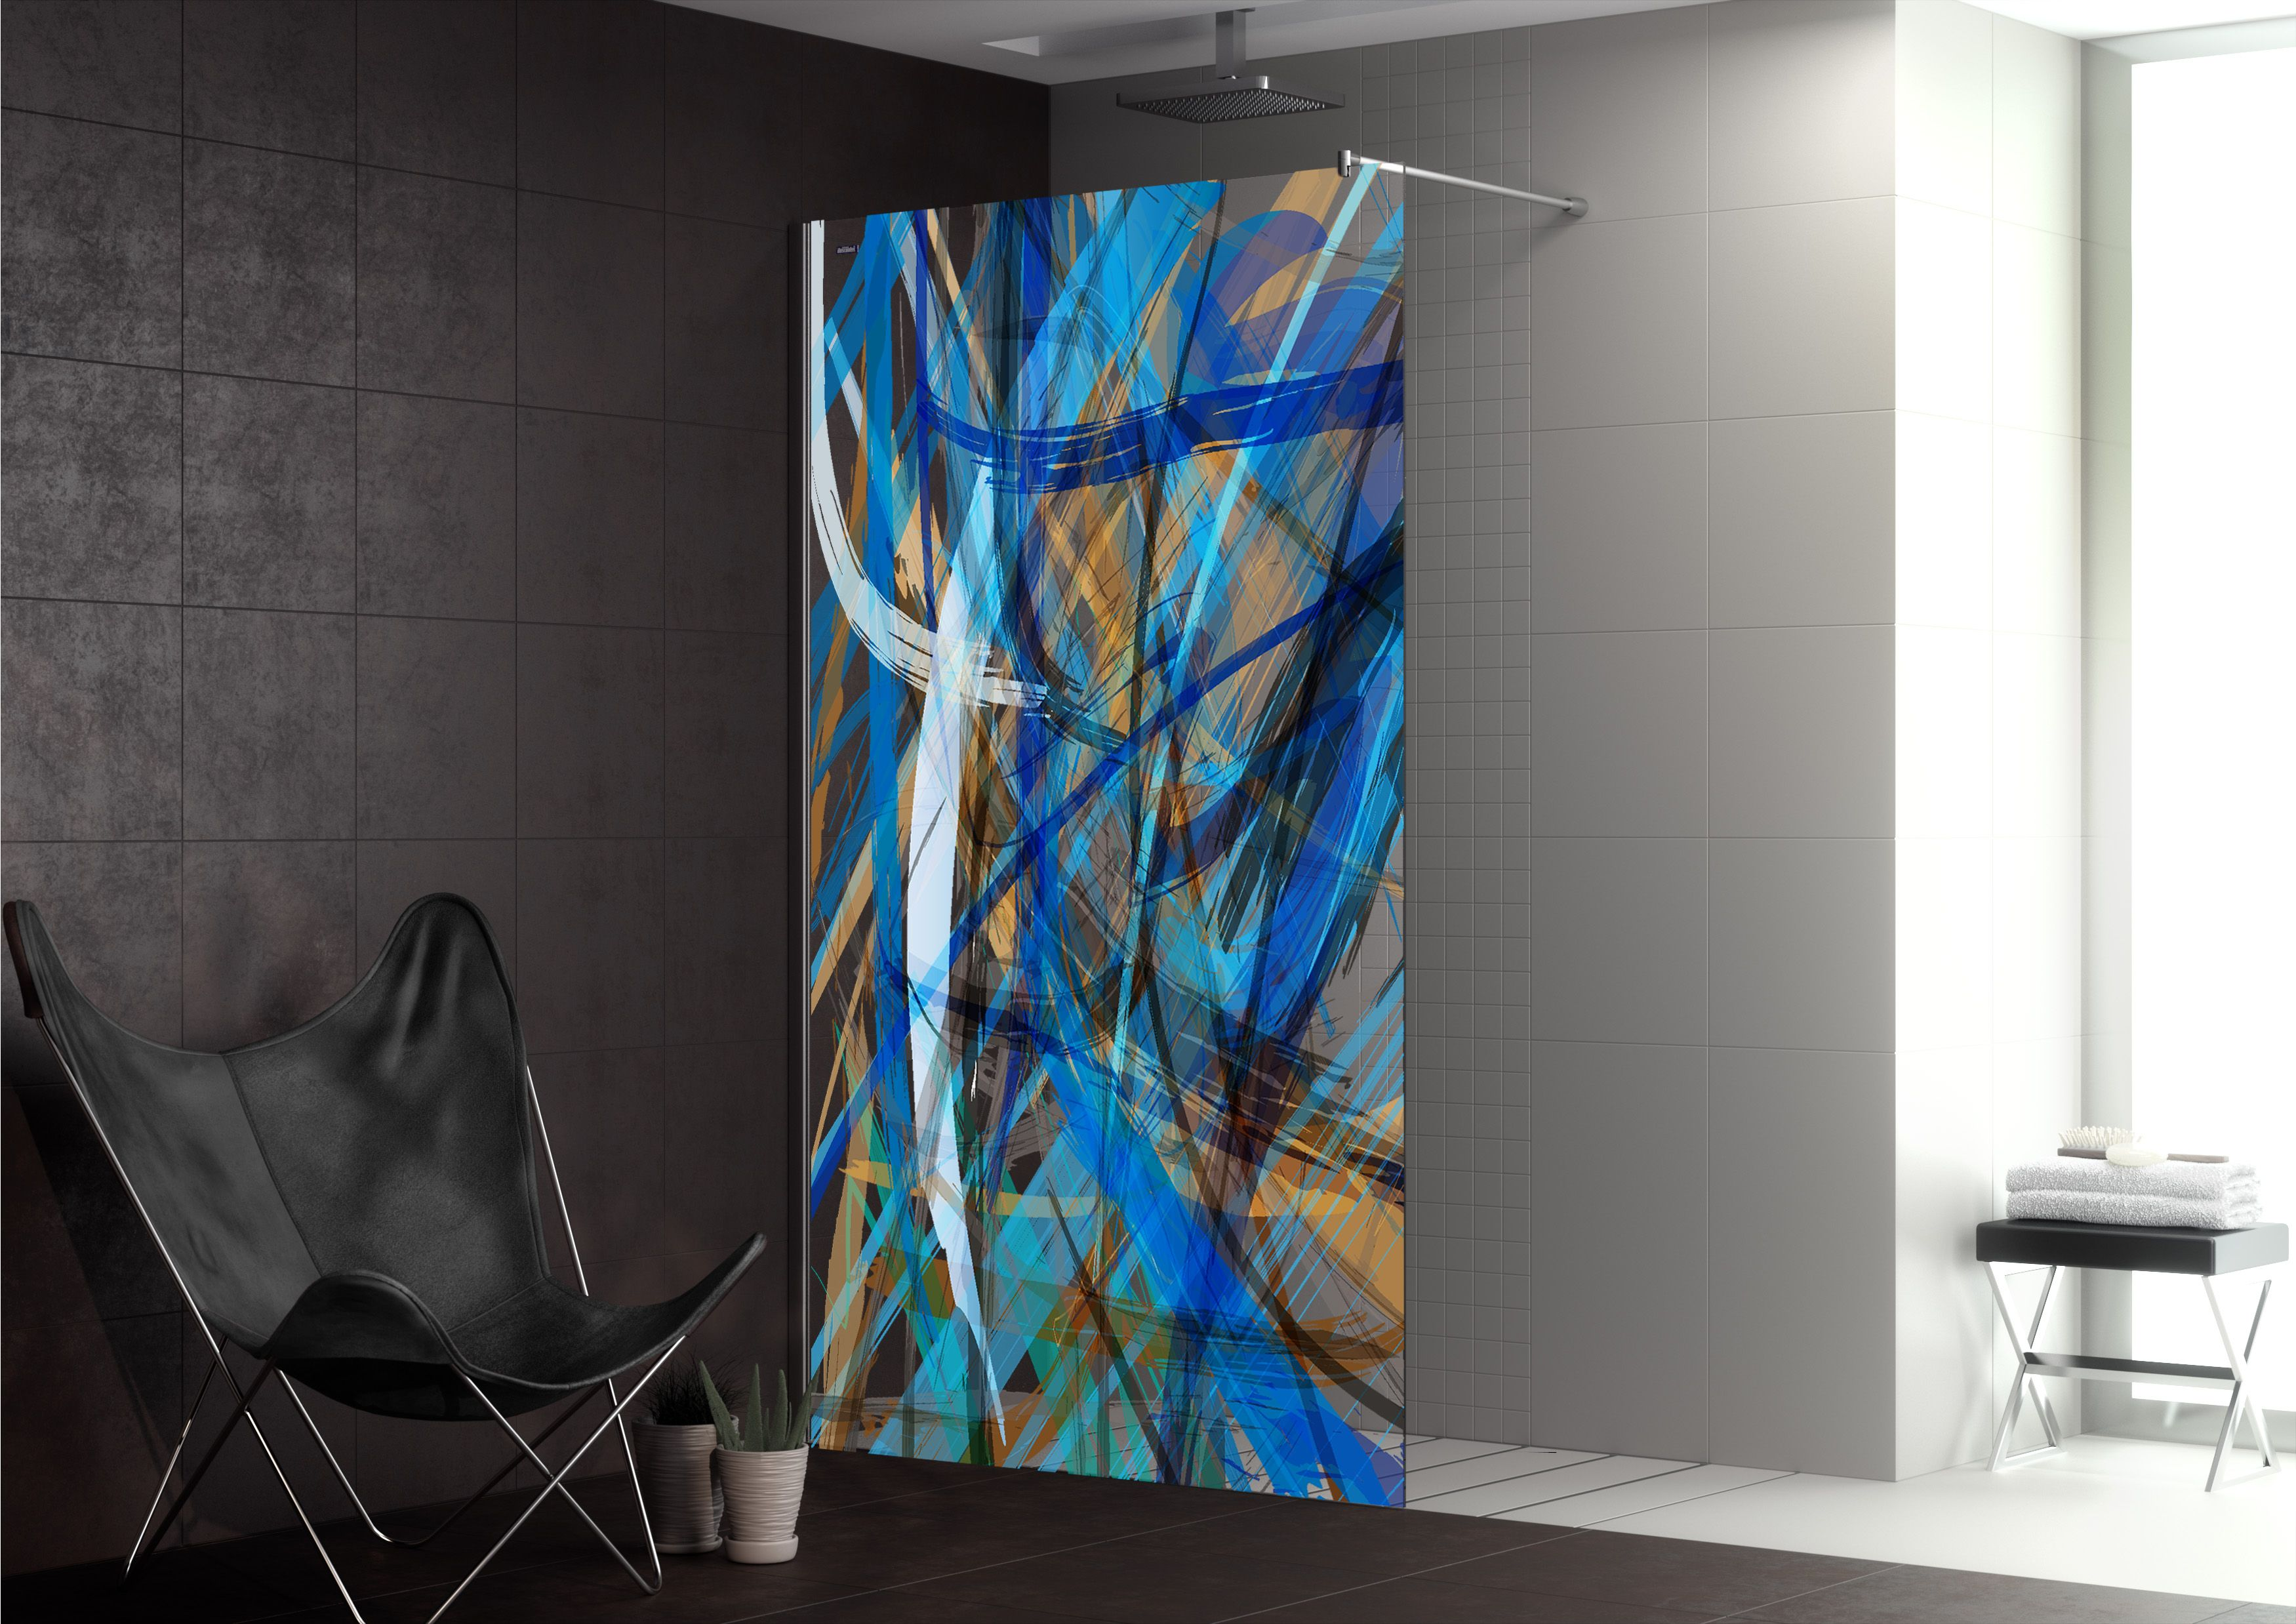 Colección Duscho Art de DUSCHOLUX #decoracion #design #bathroom shower doors